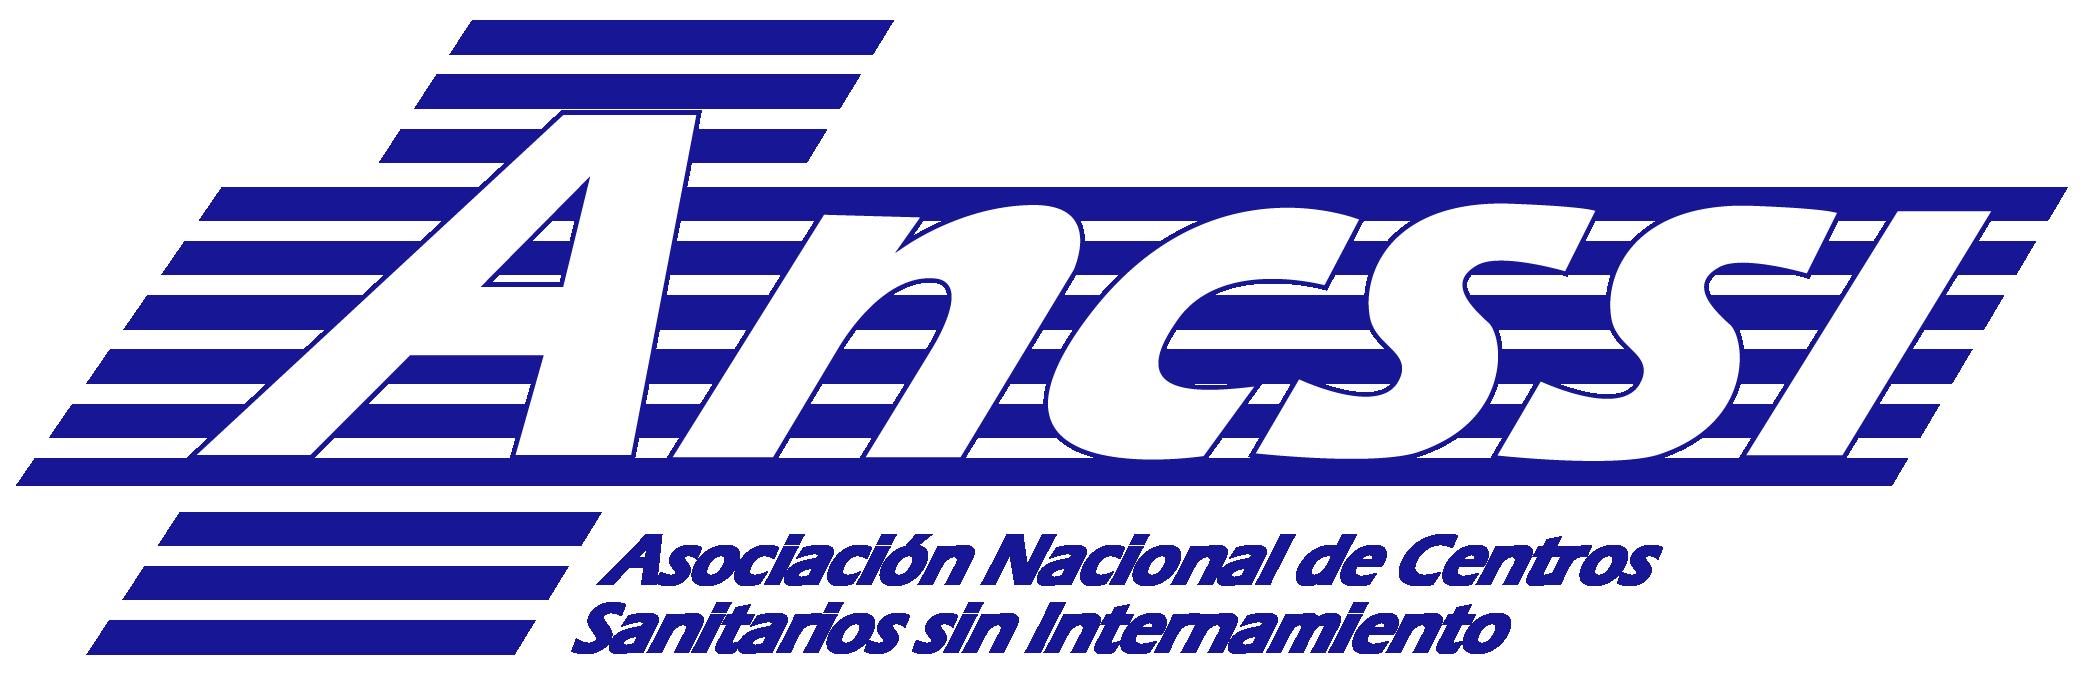 Asociación Nacional de Centros Sanitarios Sin Internamiento